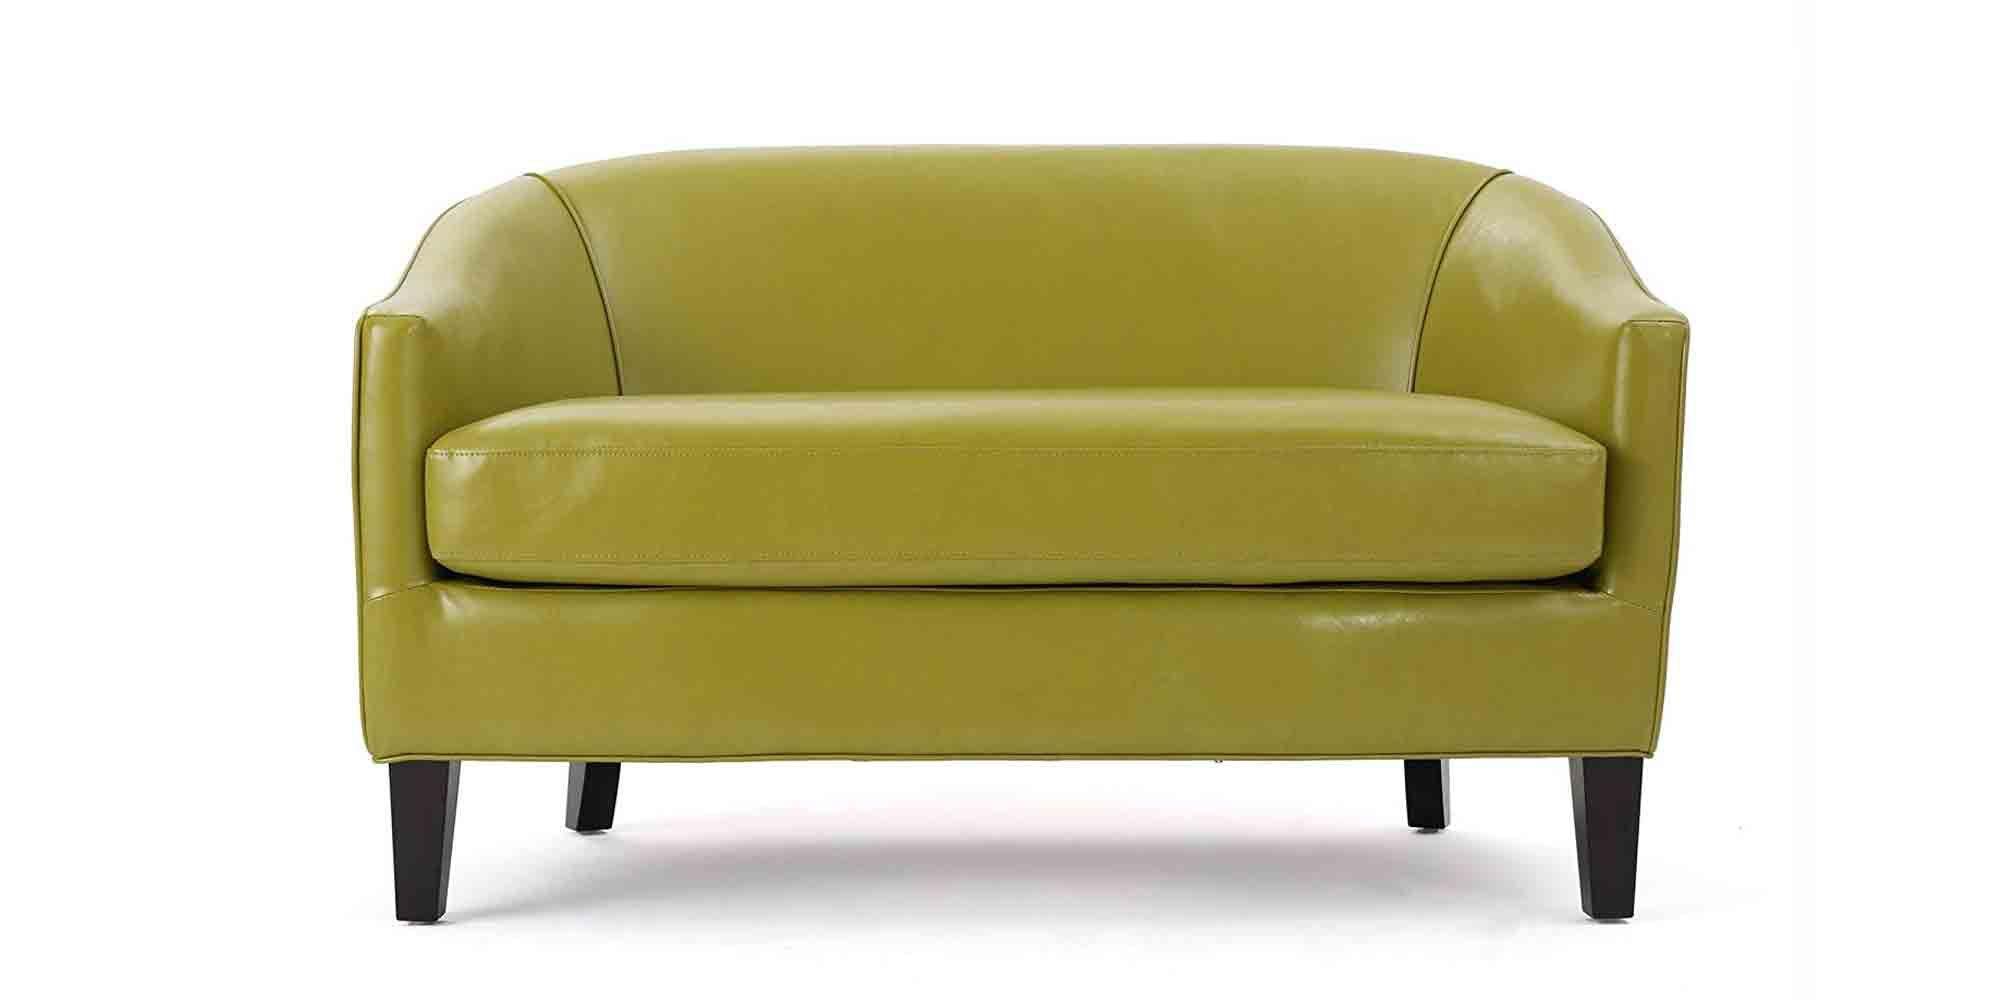 Terrific Justine Loveseat Sofa Beatyapartments Chair Design Images Beatyapartmentscom